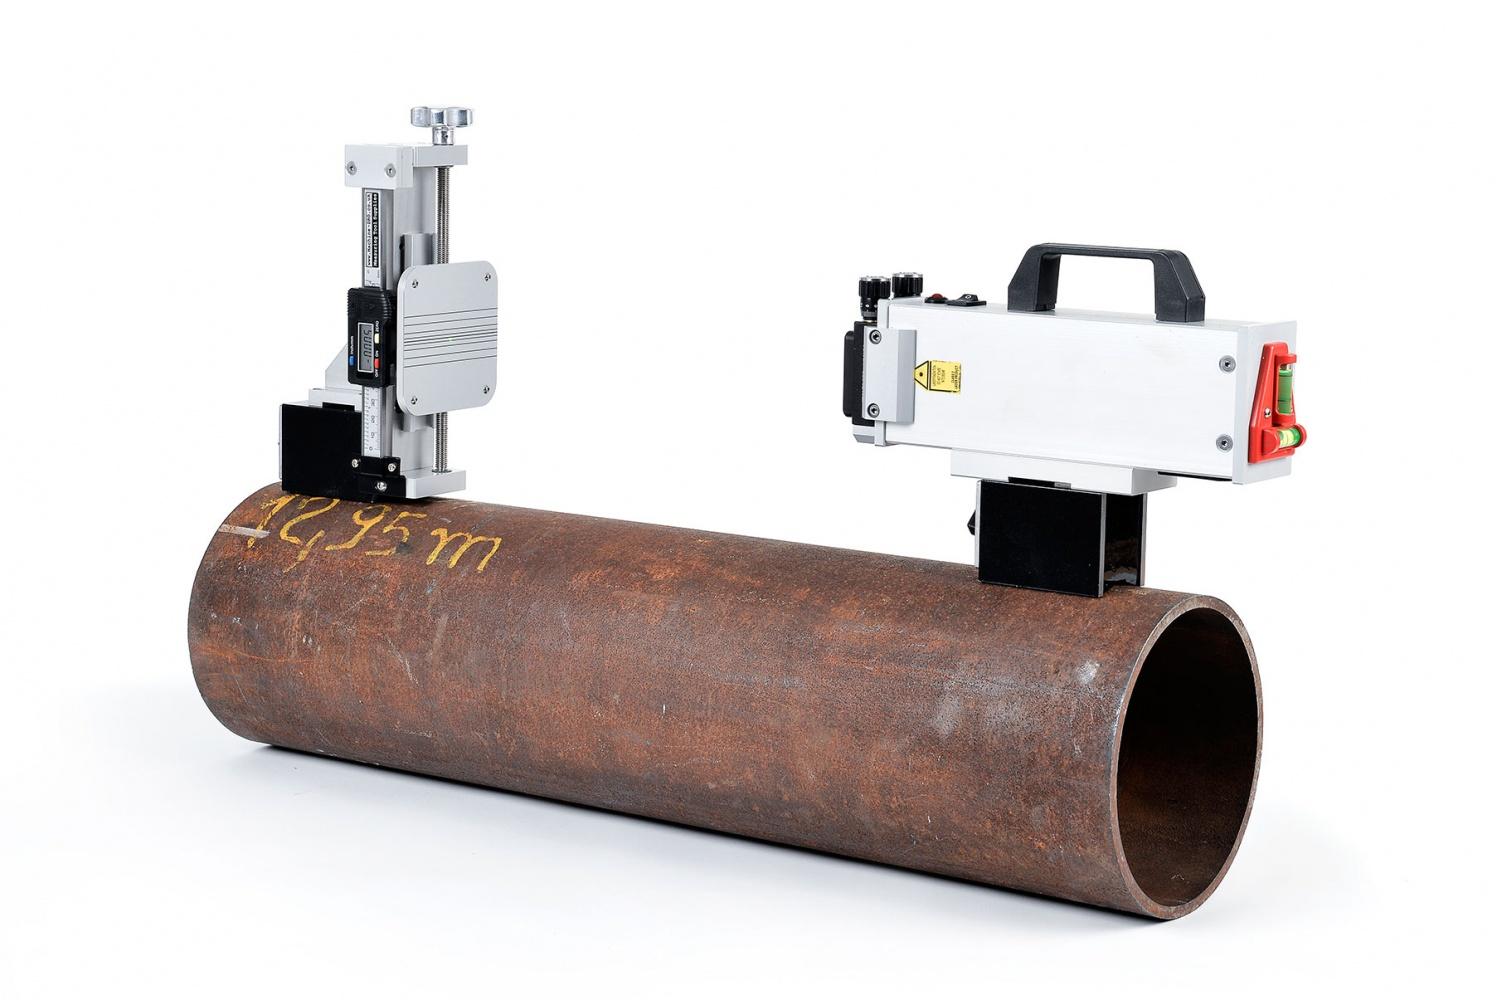 pipe-straightness-tool-01.jpg